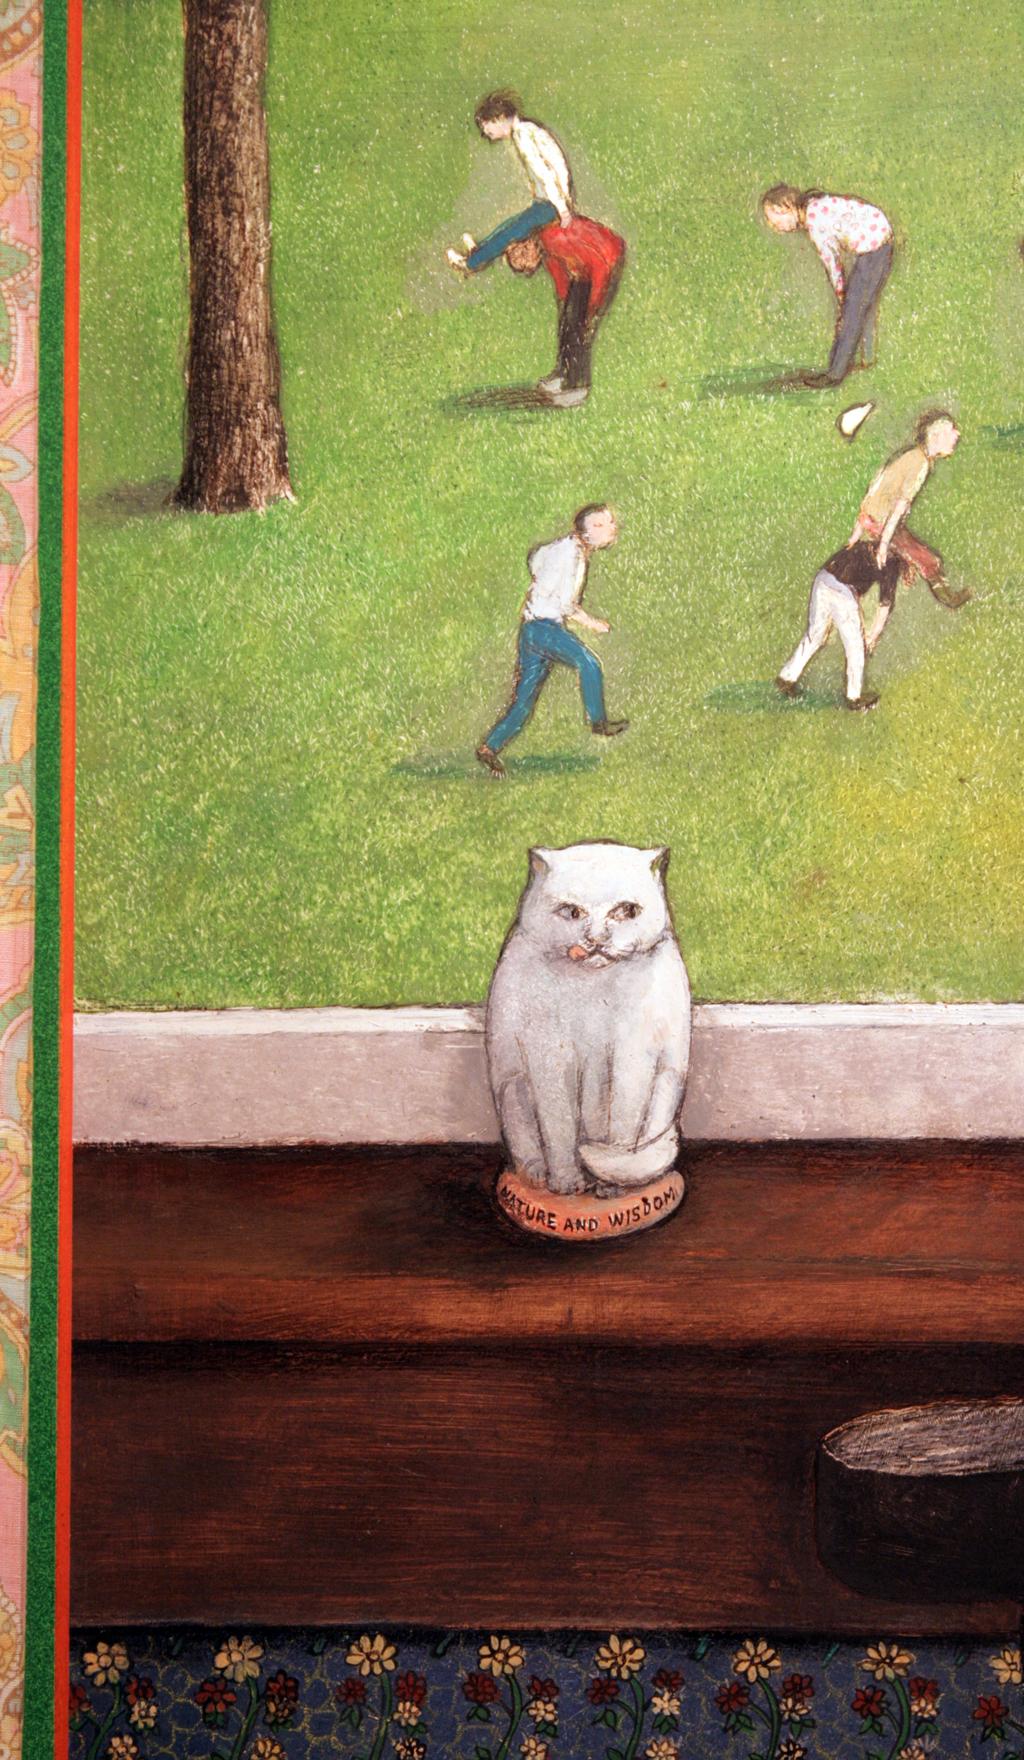 "William Kurelek, Untitled (Nature and Wisdom), c.1976, Acrylic on board, 24"" x 24"" (detail)"